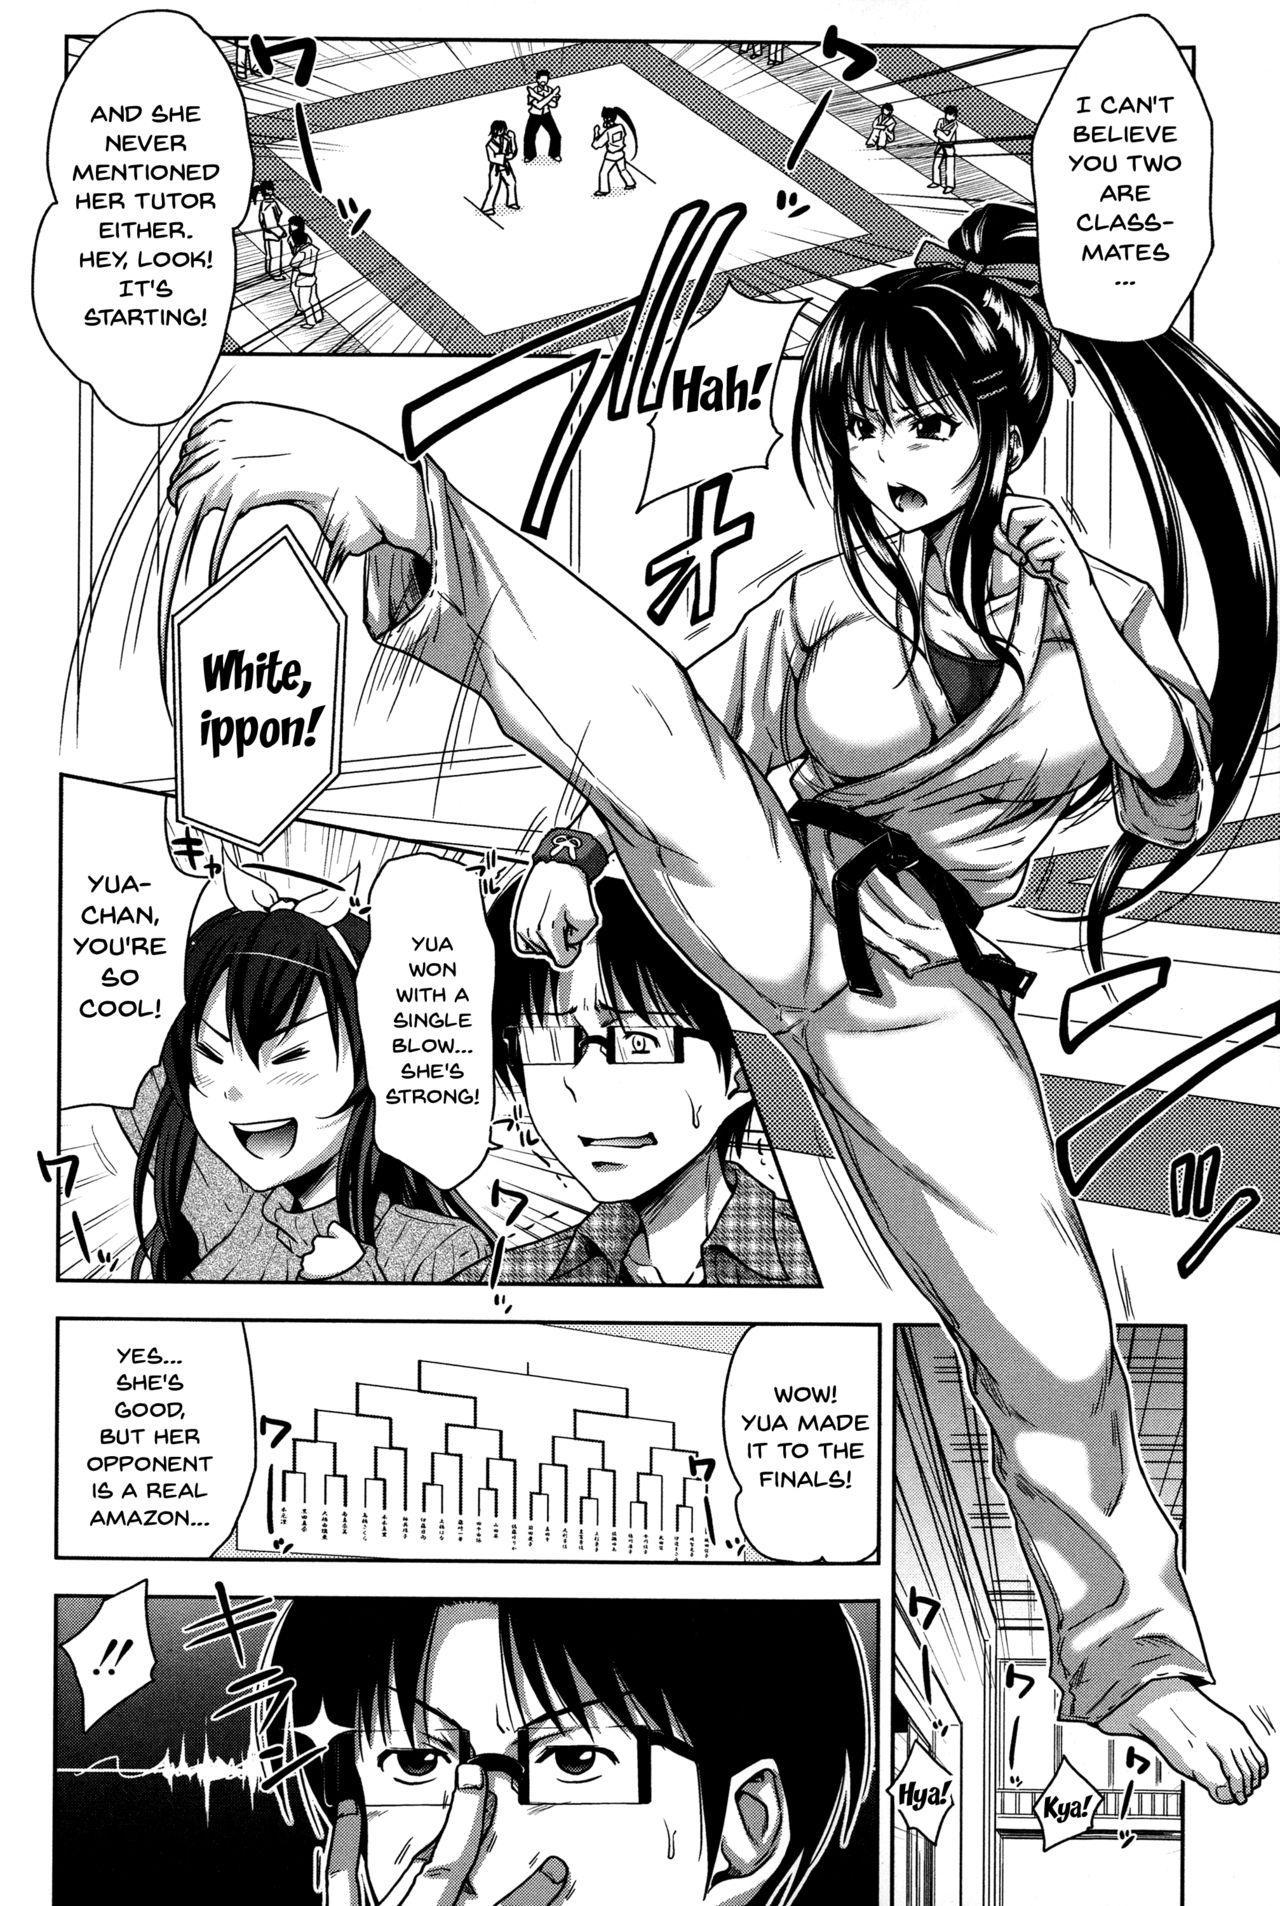 [Takuwan] Pakotate! Seikouritsu 0% no Teppeki Bishojo VS Seikouritsu 100% no Hentai Katei Kyoushi   Pakotate! Sex Rate 0% Iron-Willed Beautiful Virgins VS Sex Rate 100% Perverted Coach Ch.1-5 [English] {Doujins.com} 65